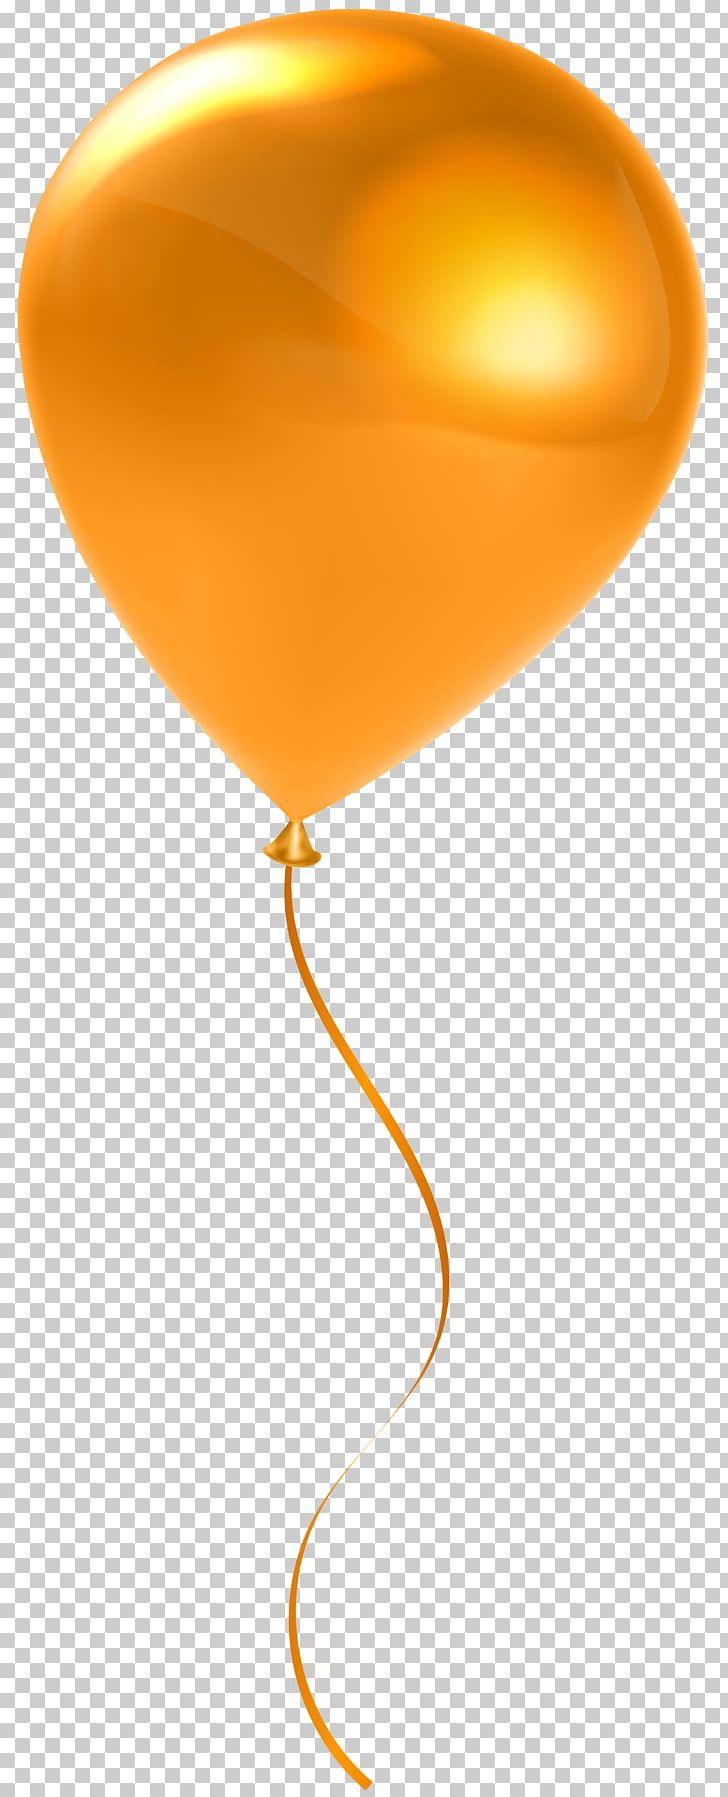 Balloon Stock Photography Orange PNG, Clipart, Balloon.